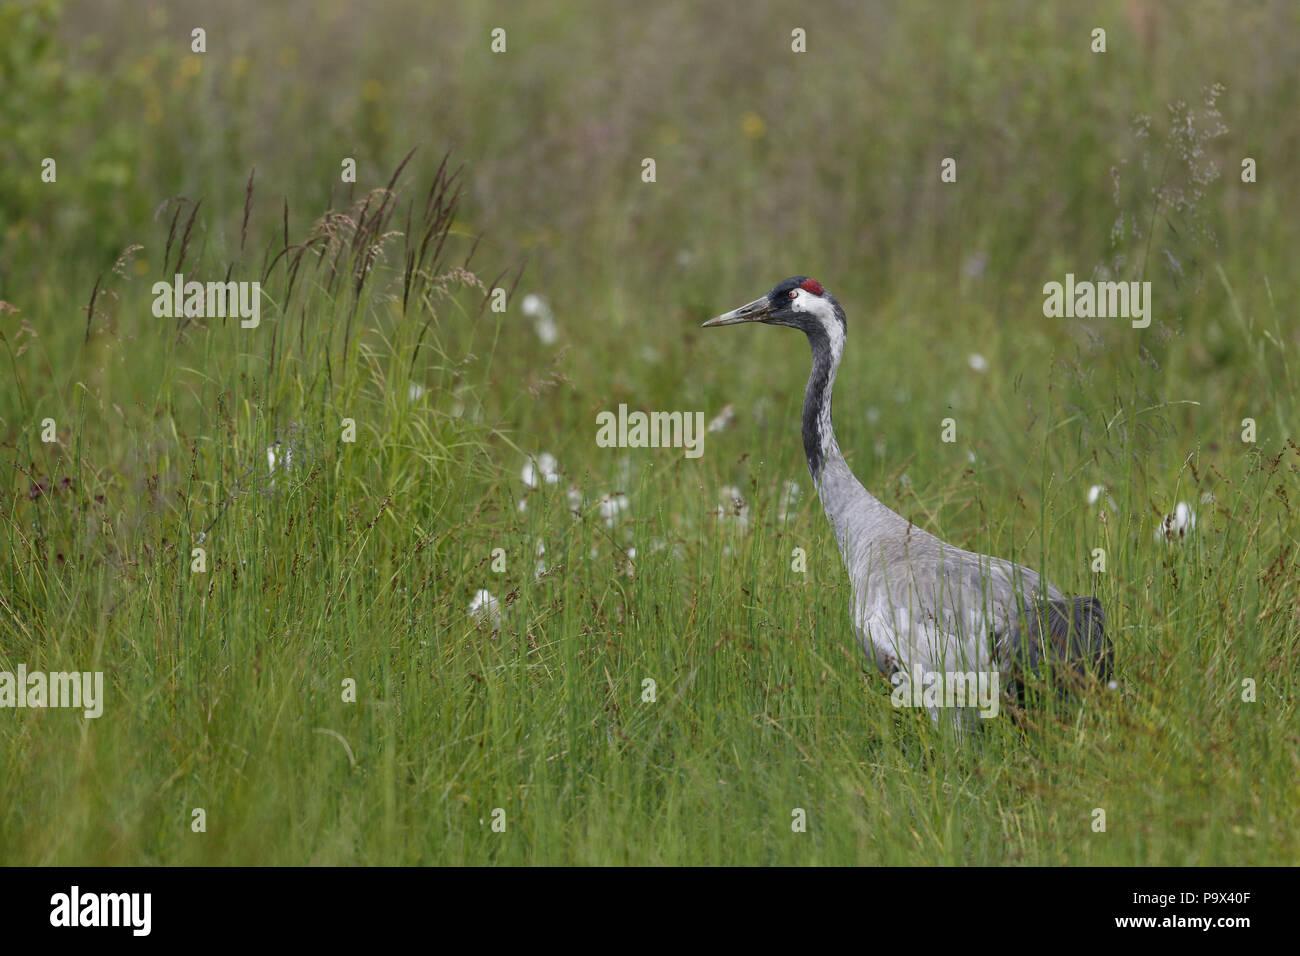 Common Crane, Grus grus in damp meadow Stock Photo